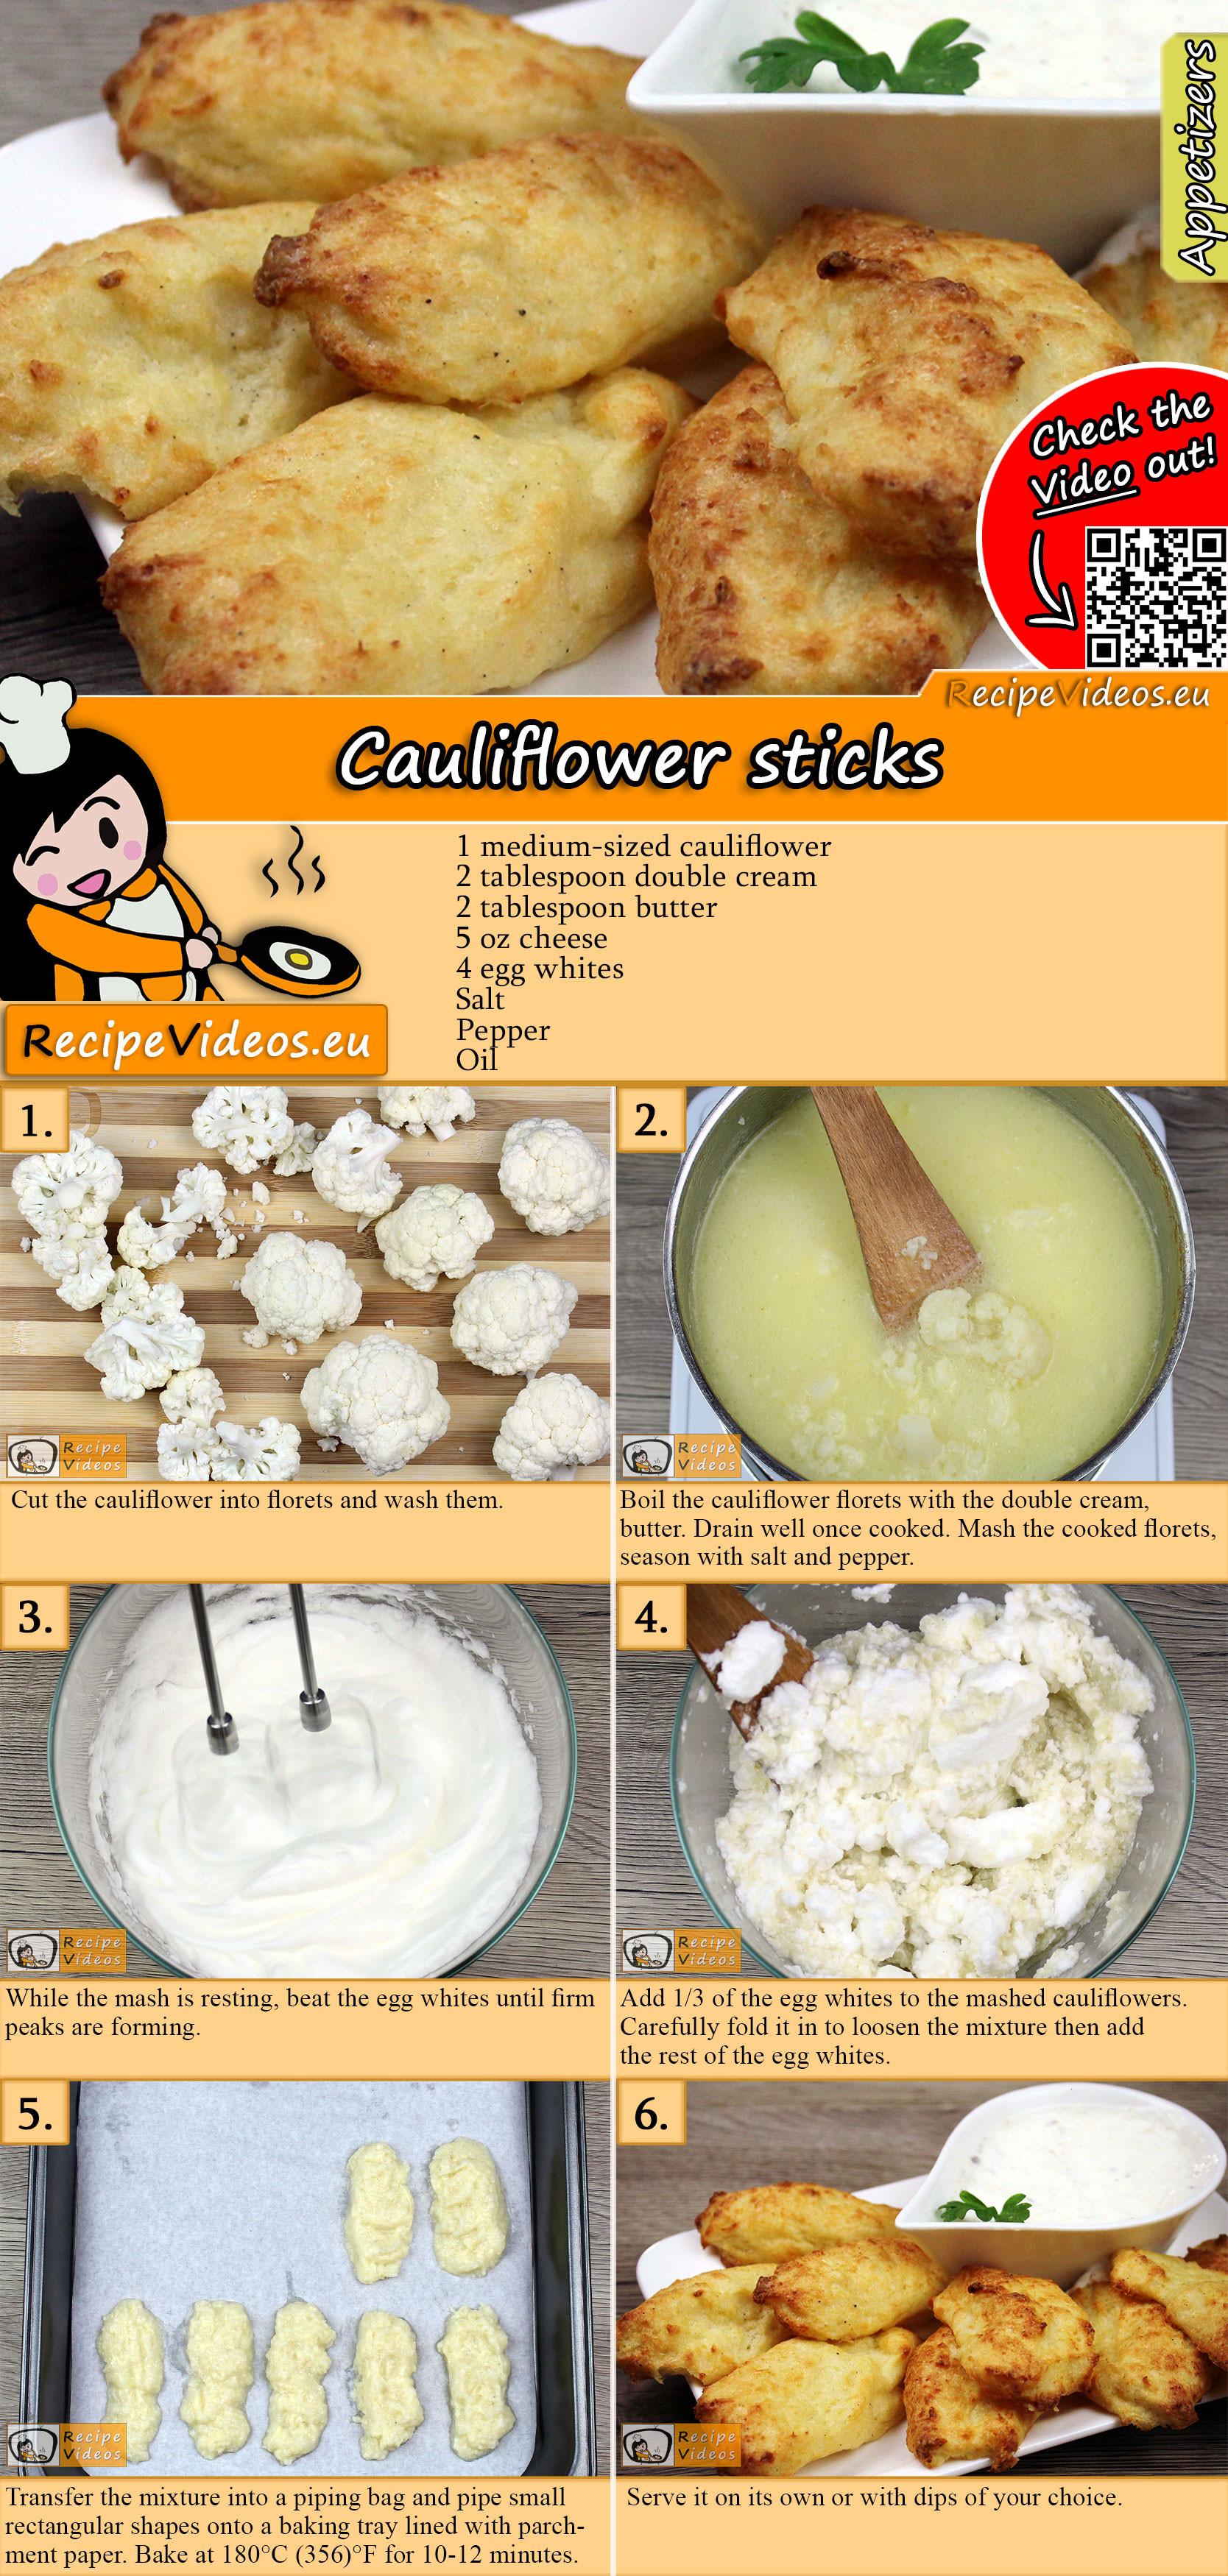 Cauliflower sticks recipe with video